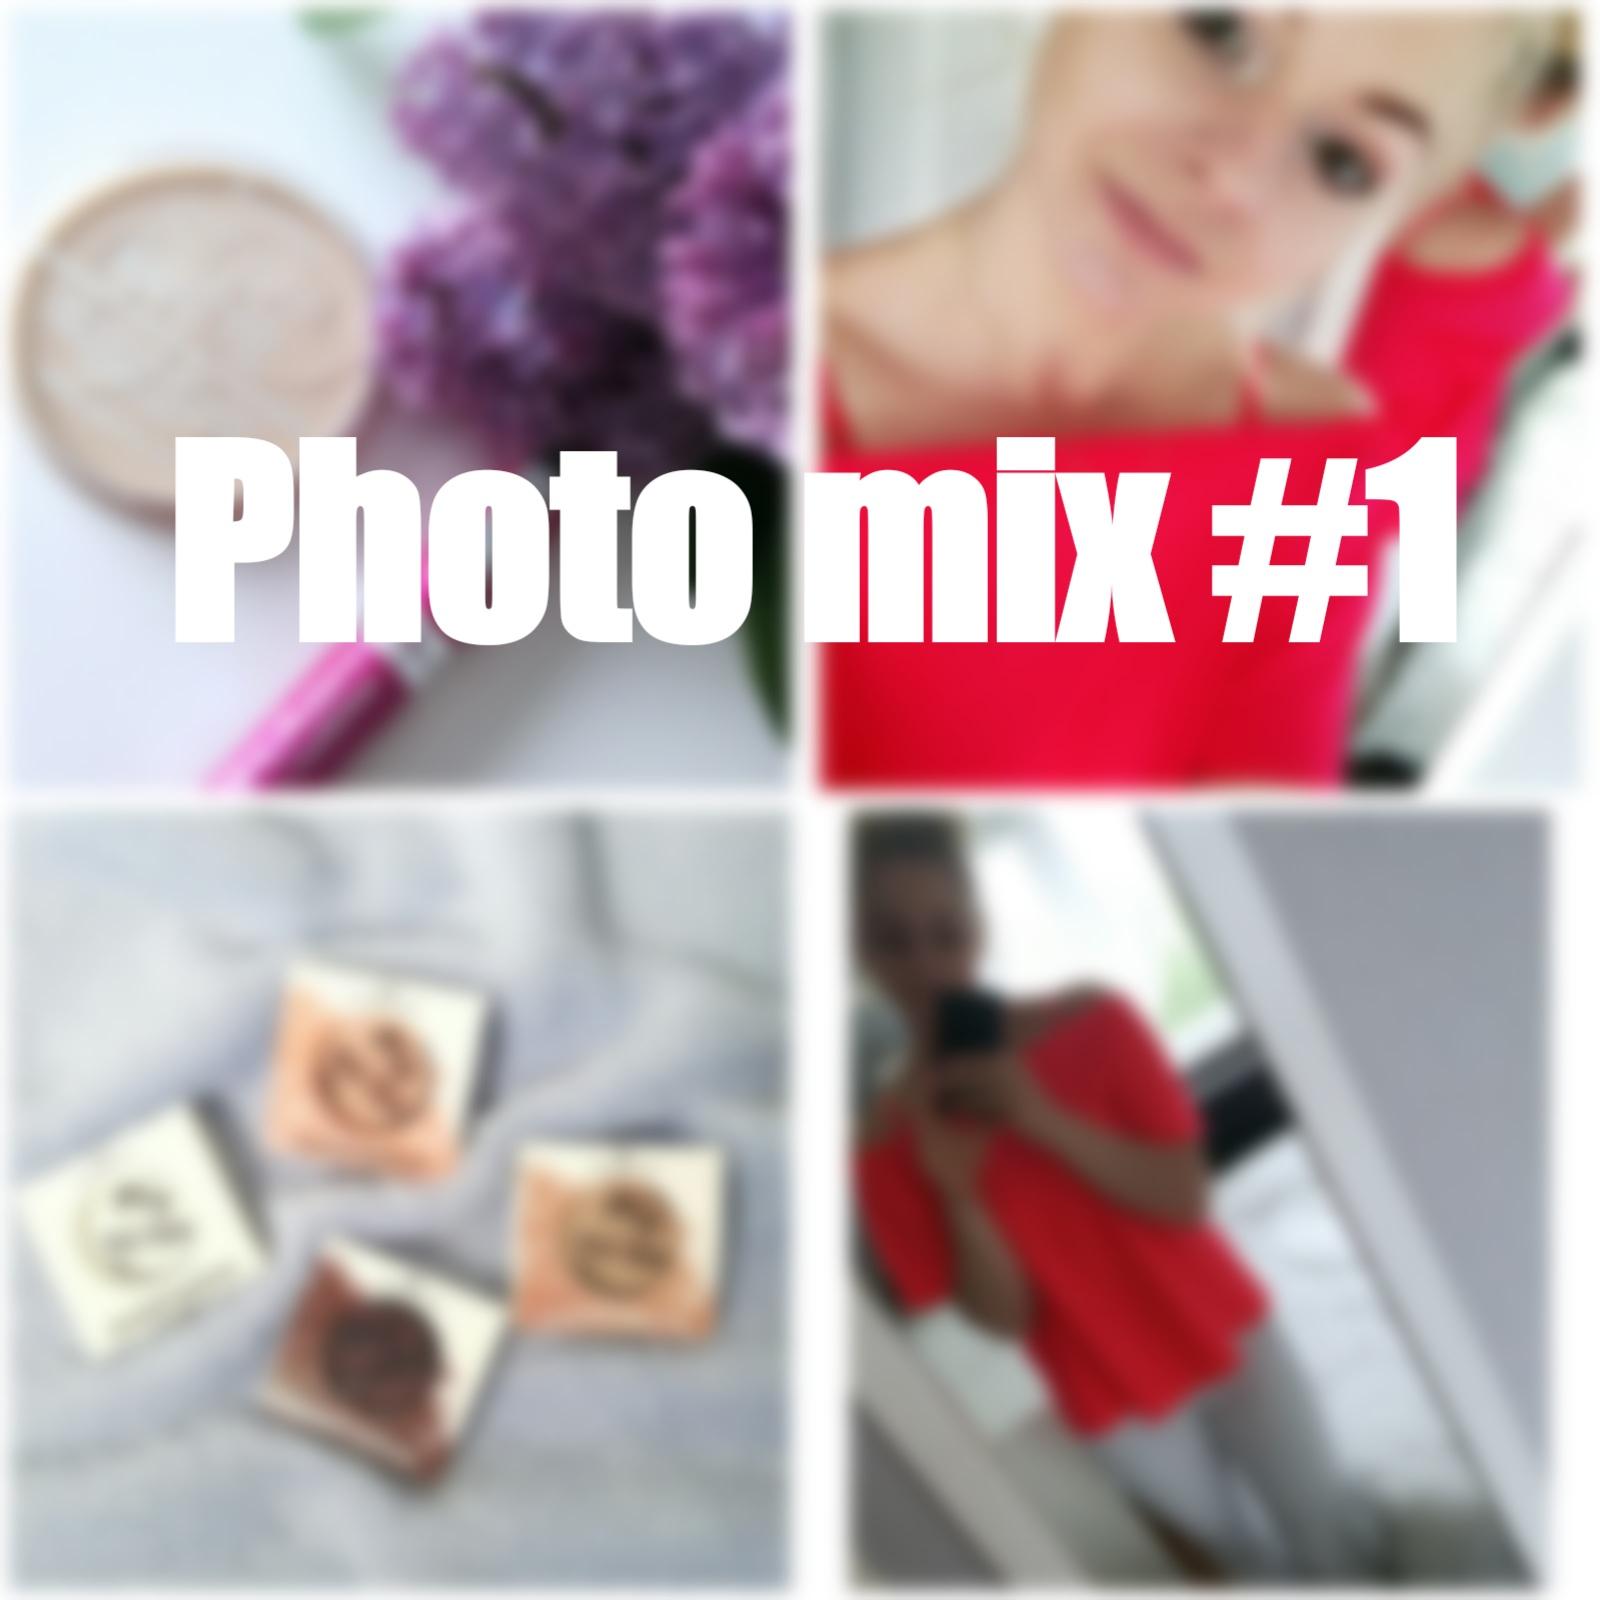 Photo mix Maj #1